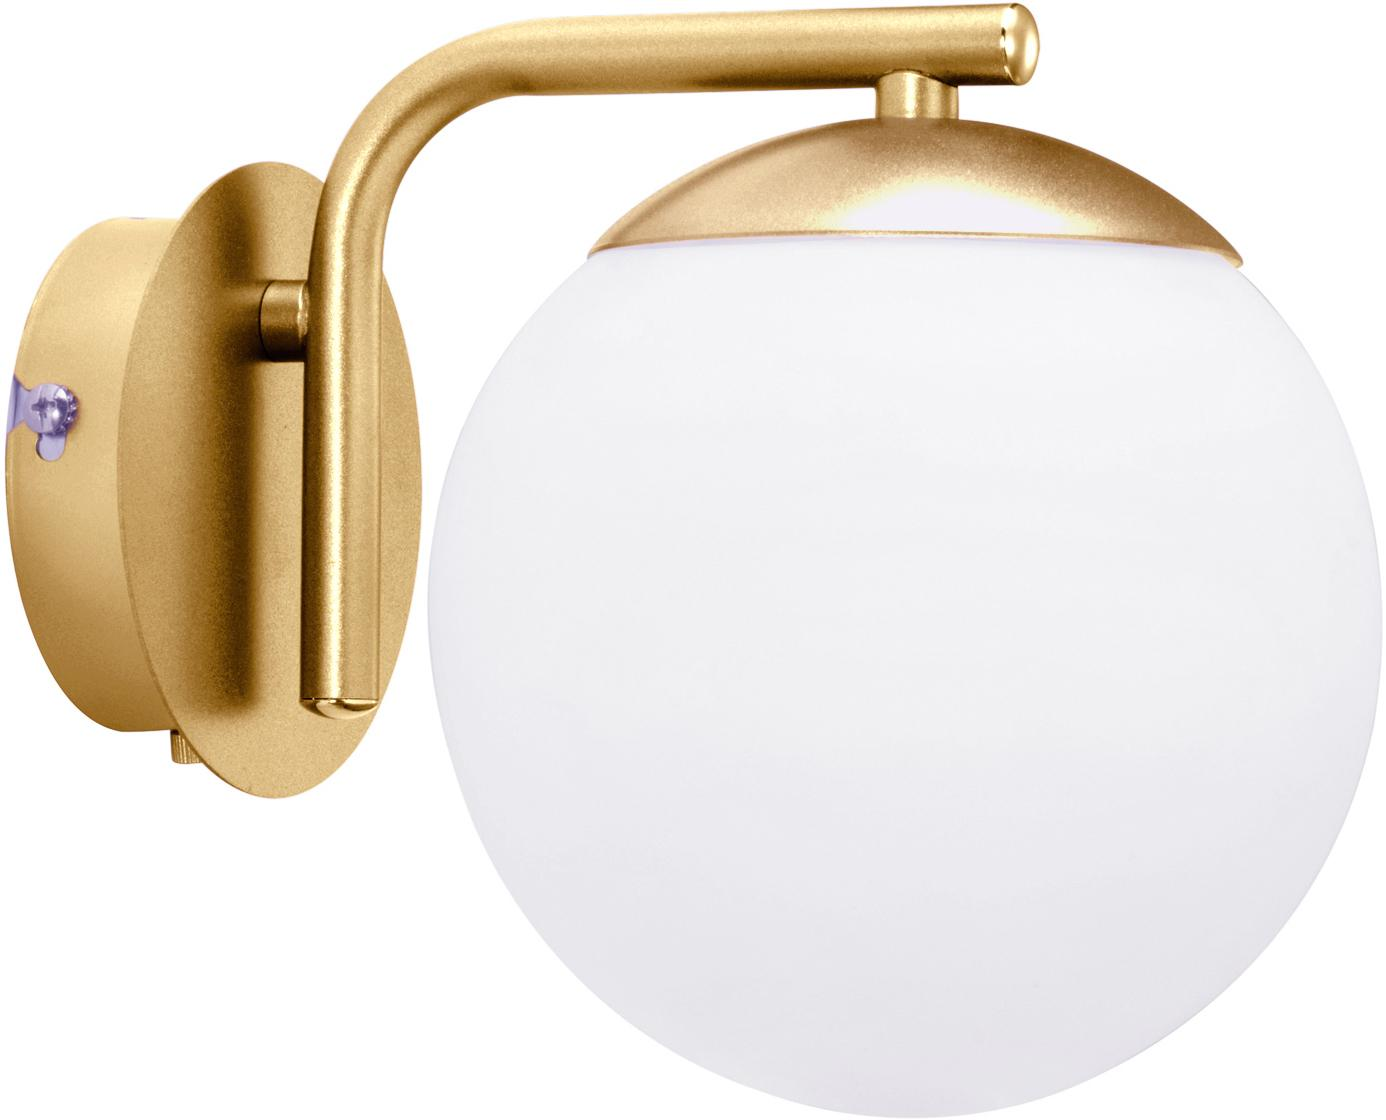 Wandleuchte Grant mit Stecker, Lampenfuß: Messing, Lampenschirm: Opalglas, Messing, Weiß, 15 x 18 cm